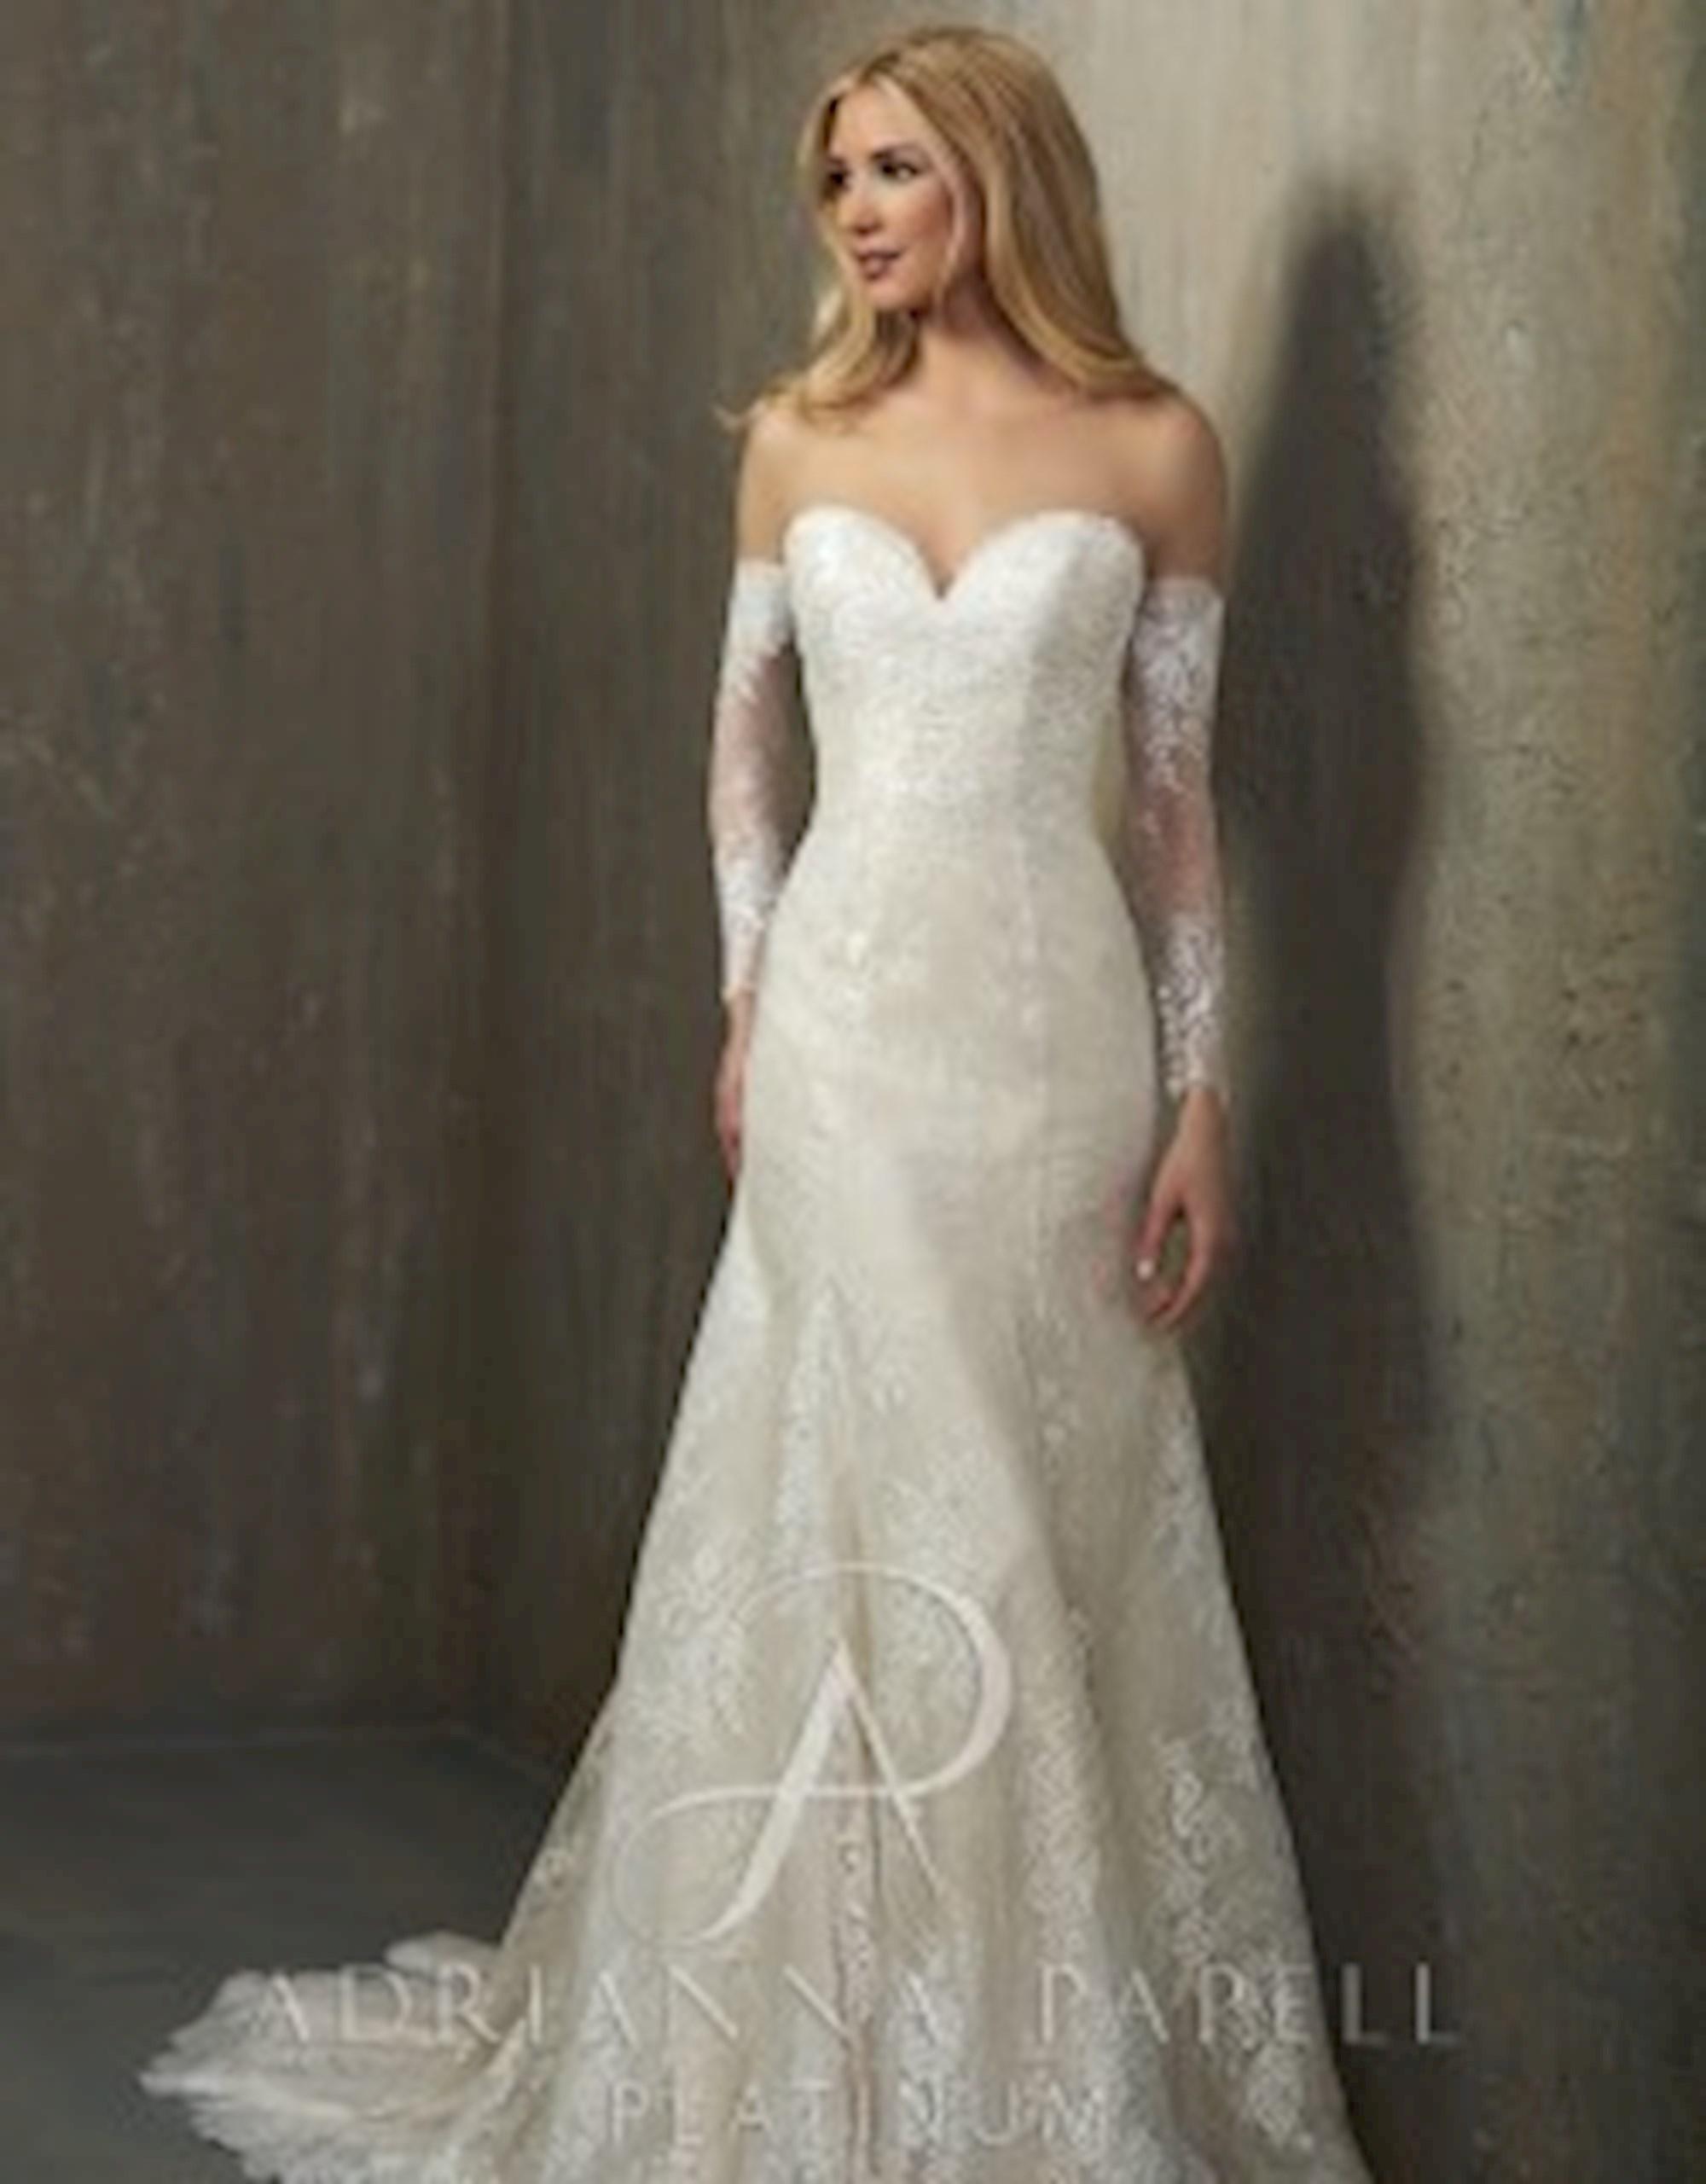 Adrianna Papell Platinum Wedding Dresses | Regiss in Kentucky - 31057